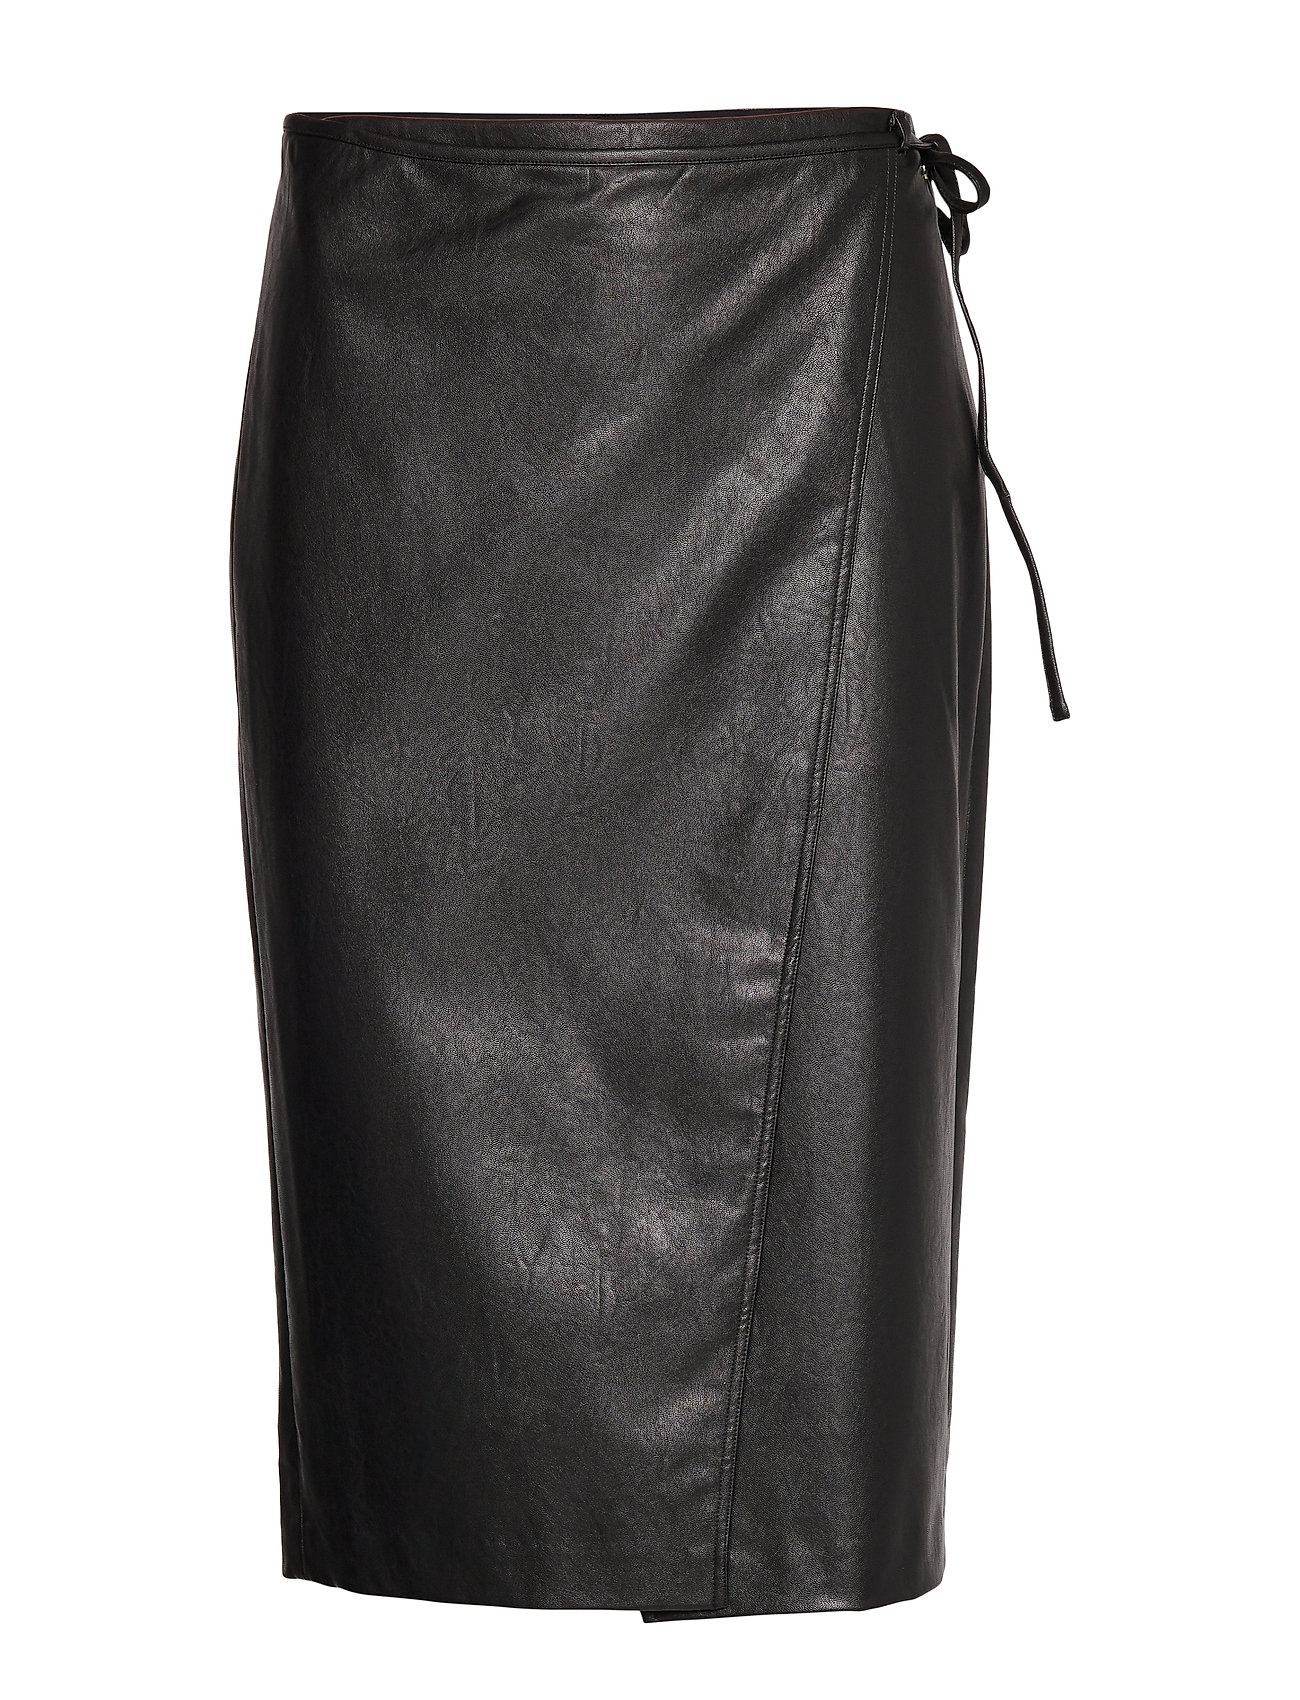 Armani Exchange AX WOMAN SKIRT - BLACK